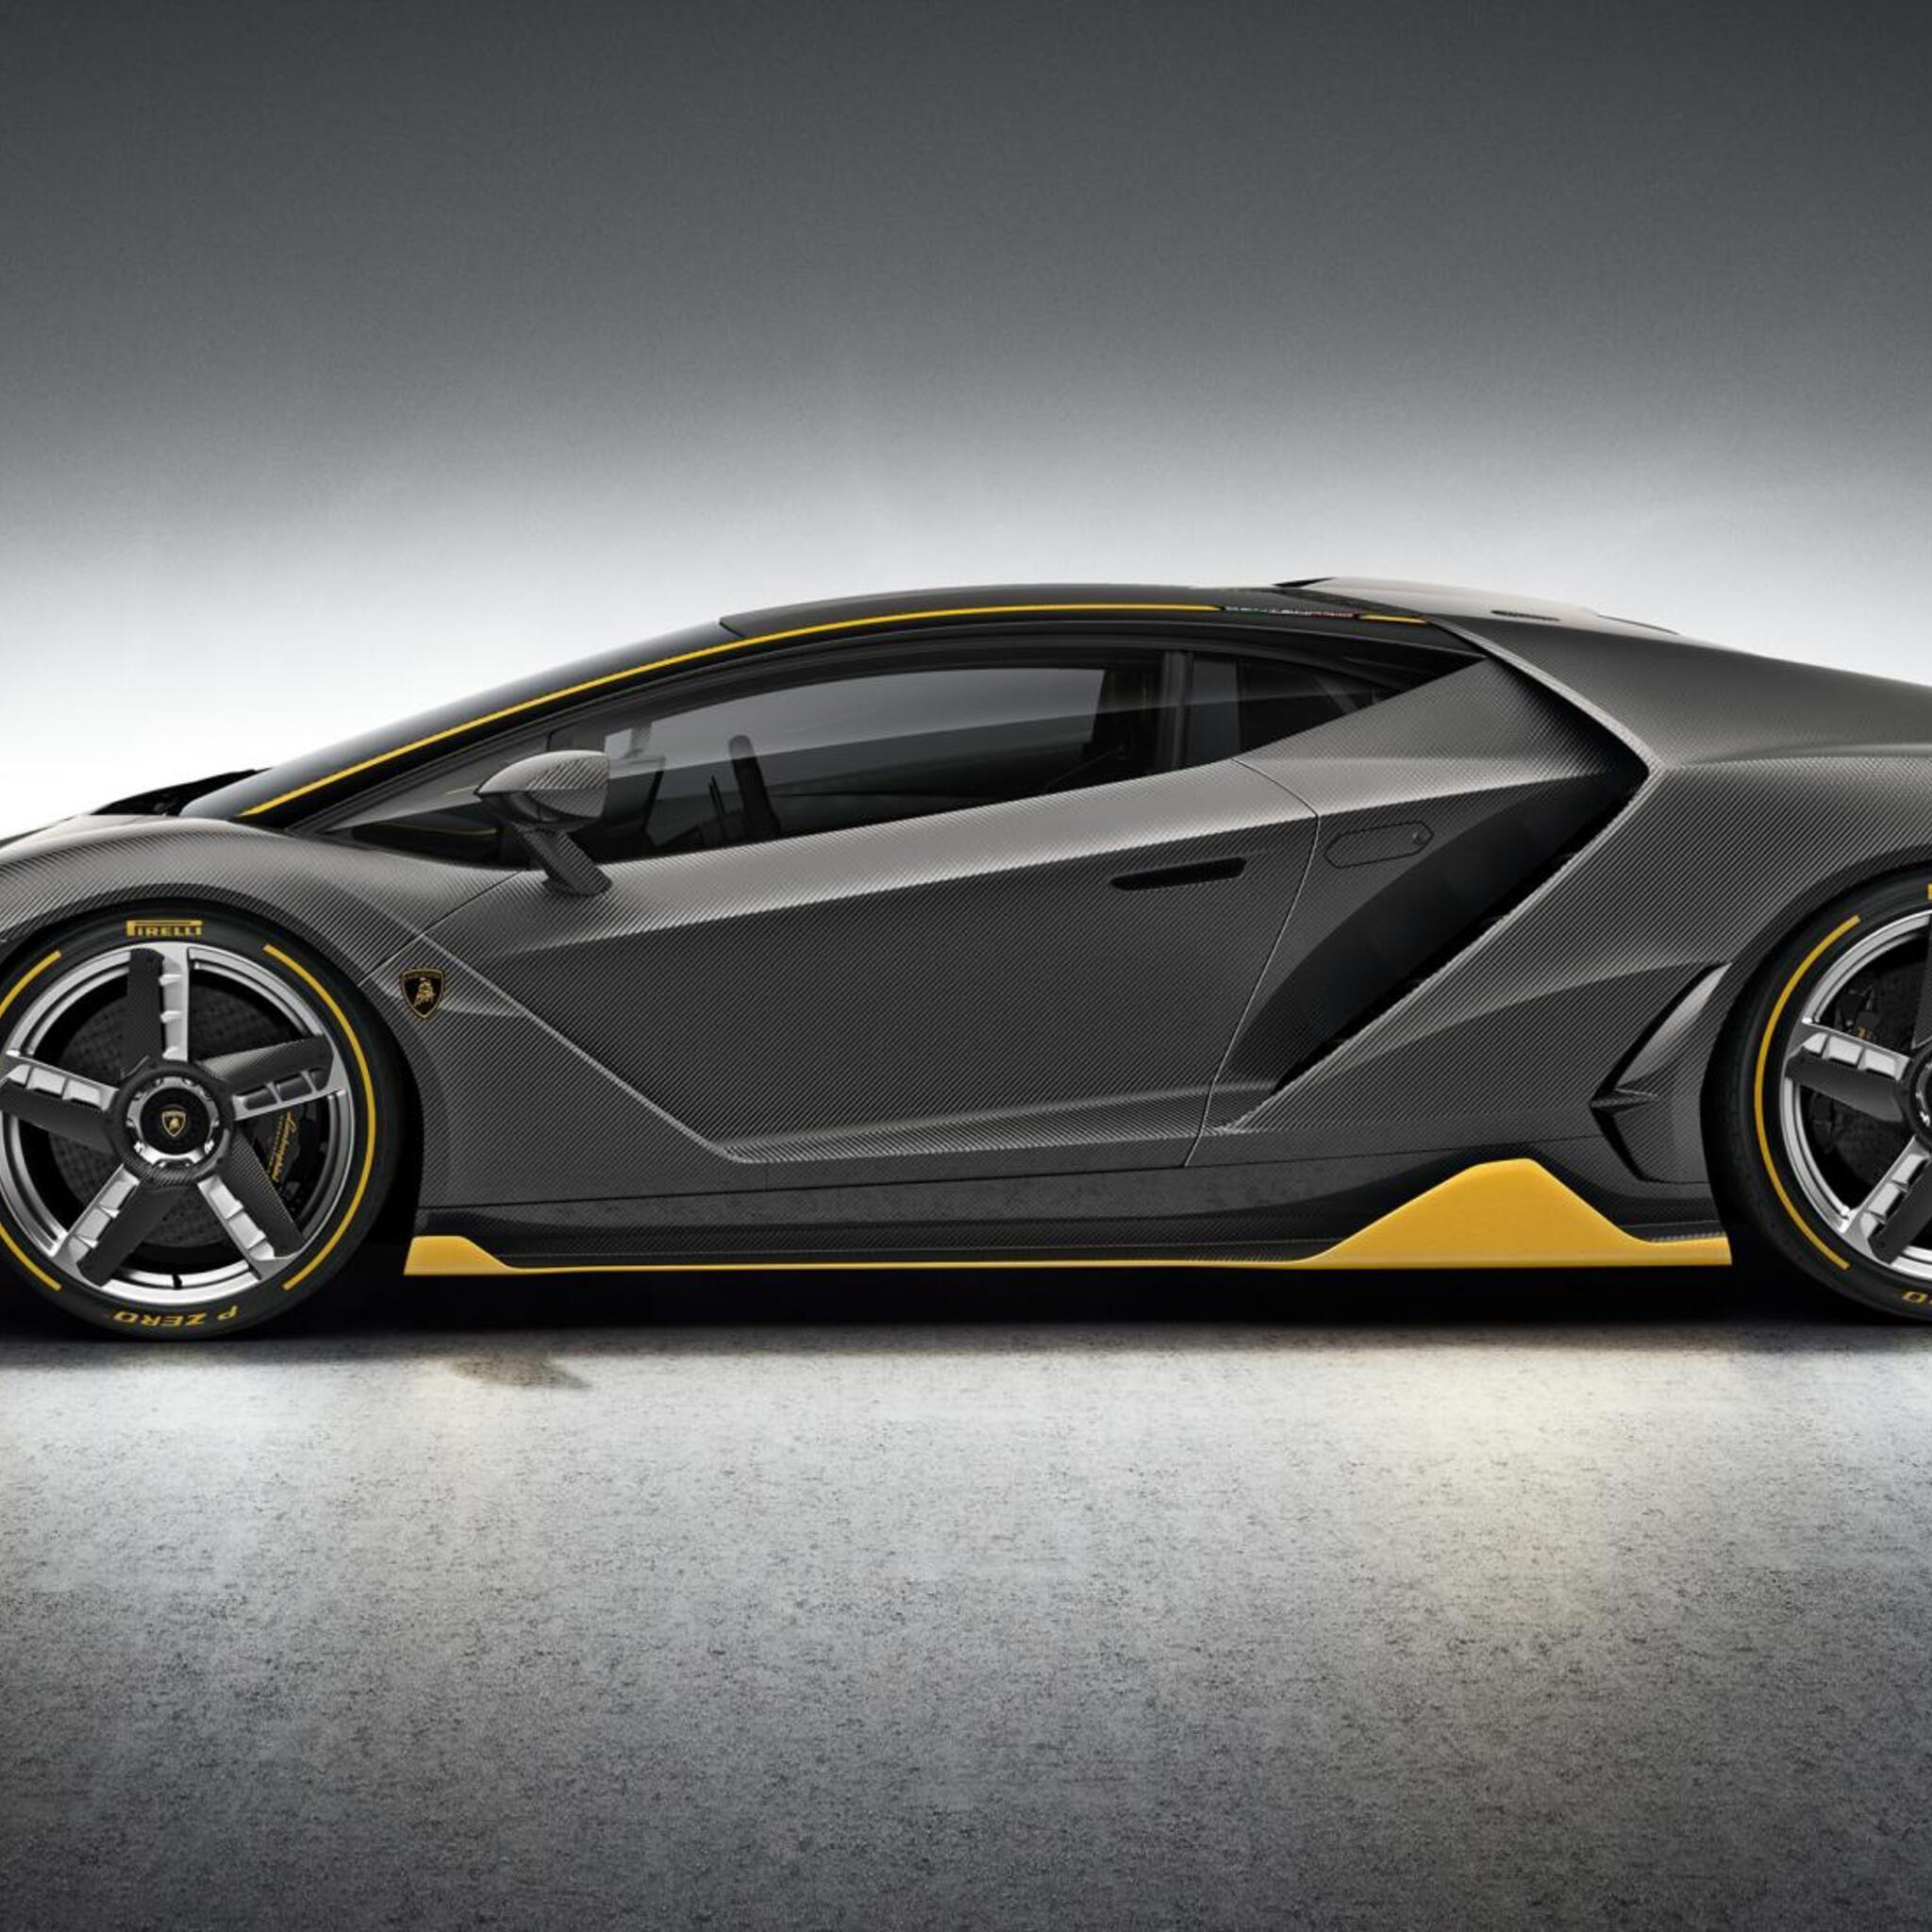 Wallpaper Lamborghini Centenario 4k Rear View